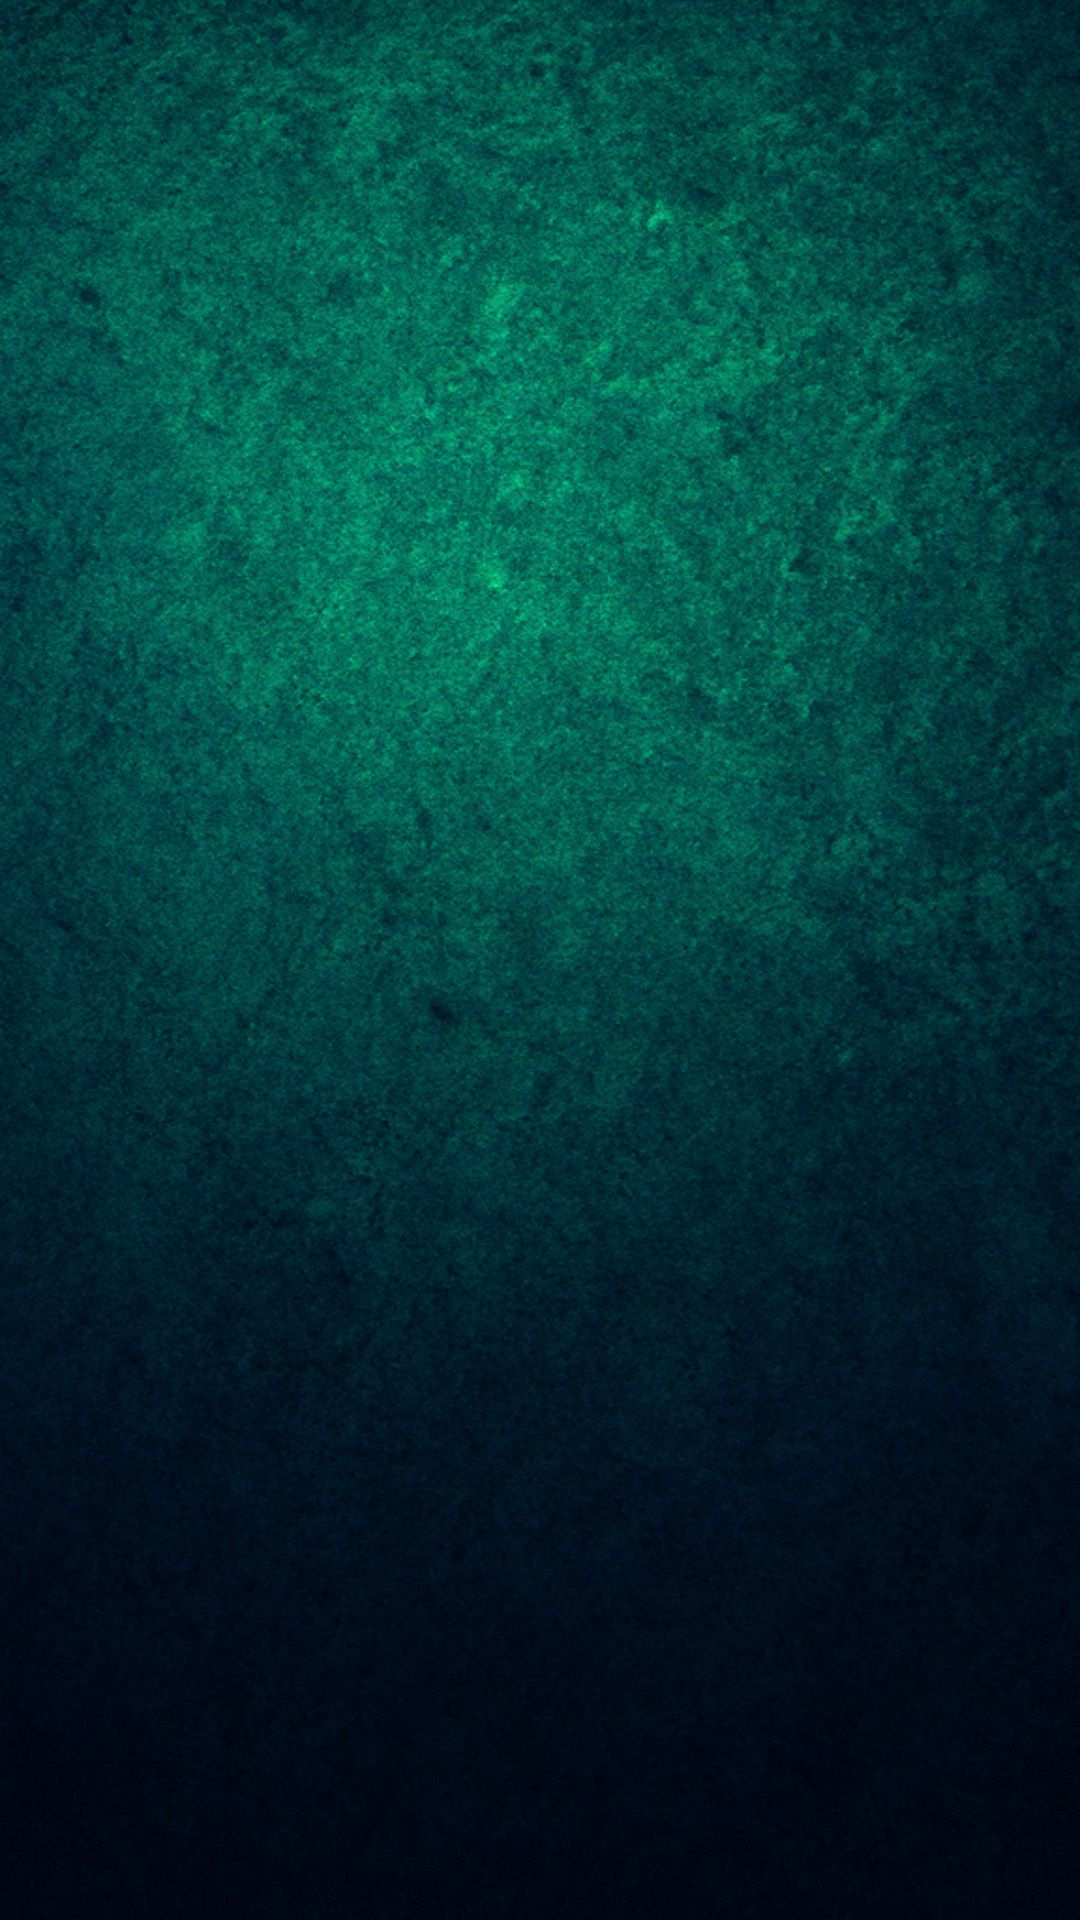 Must see Wallpaper Dark Teal - lg-g3-wallpapers-hd-381_954e746e4043e35dc1cc1893eff7b8ce_raw  Photograph_433354 .jpg